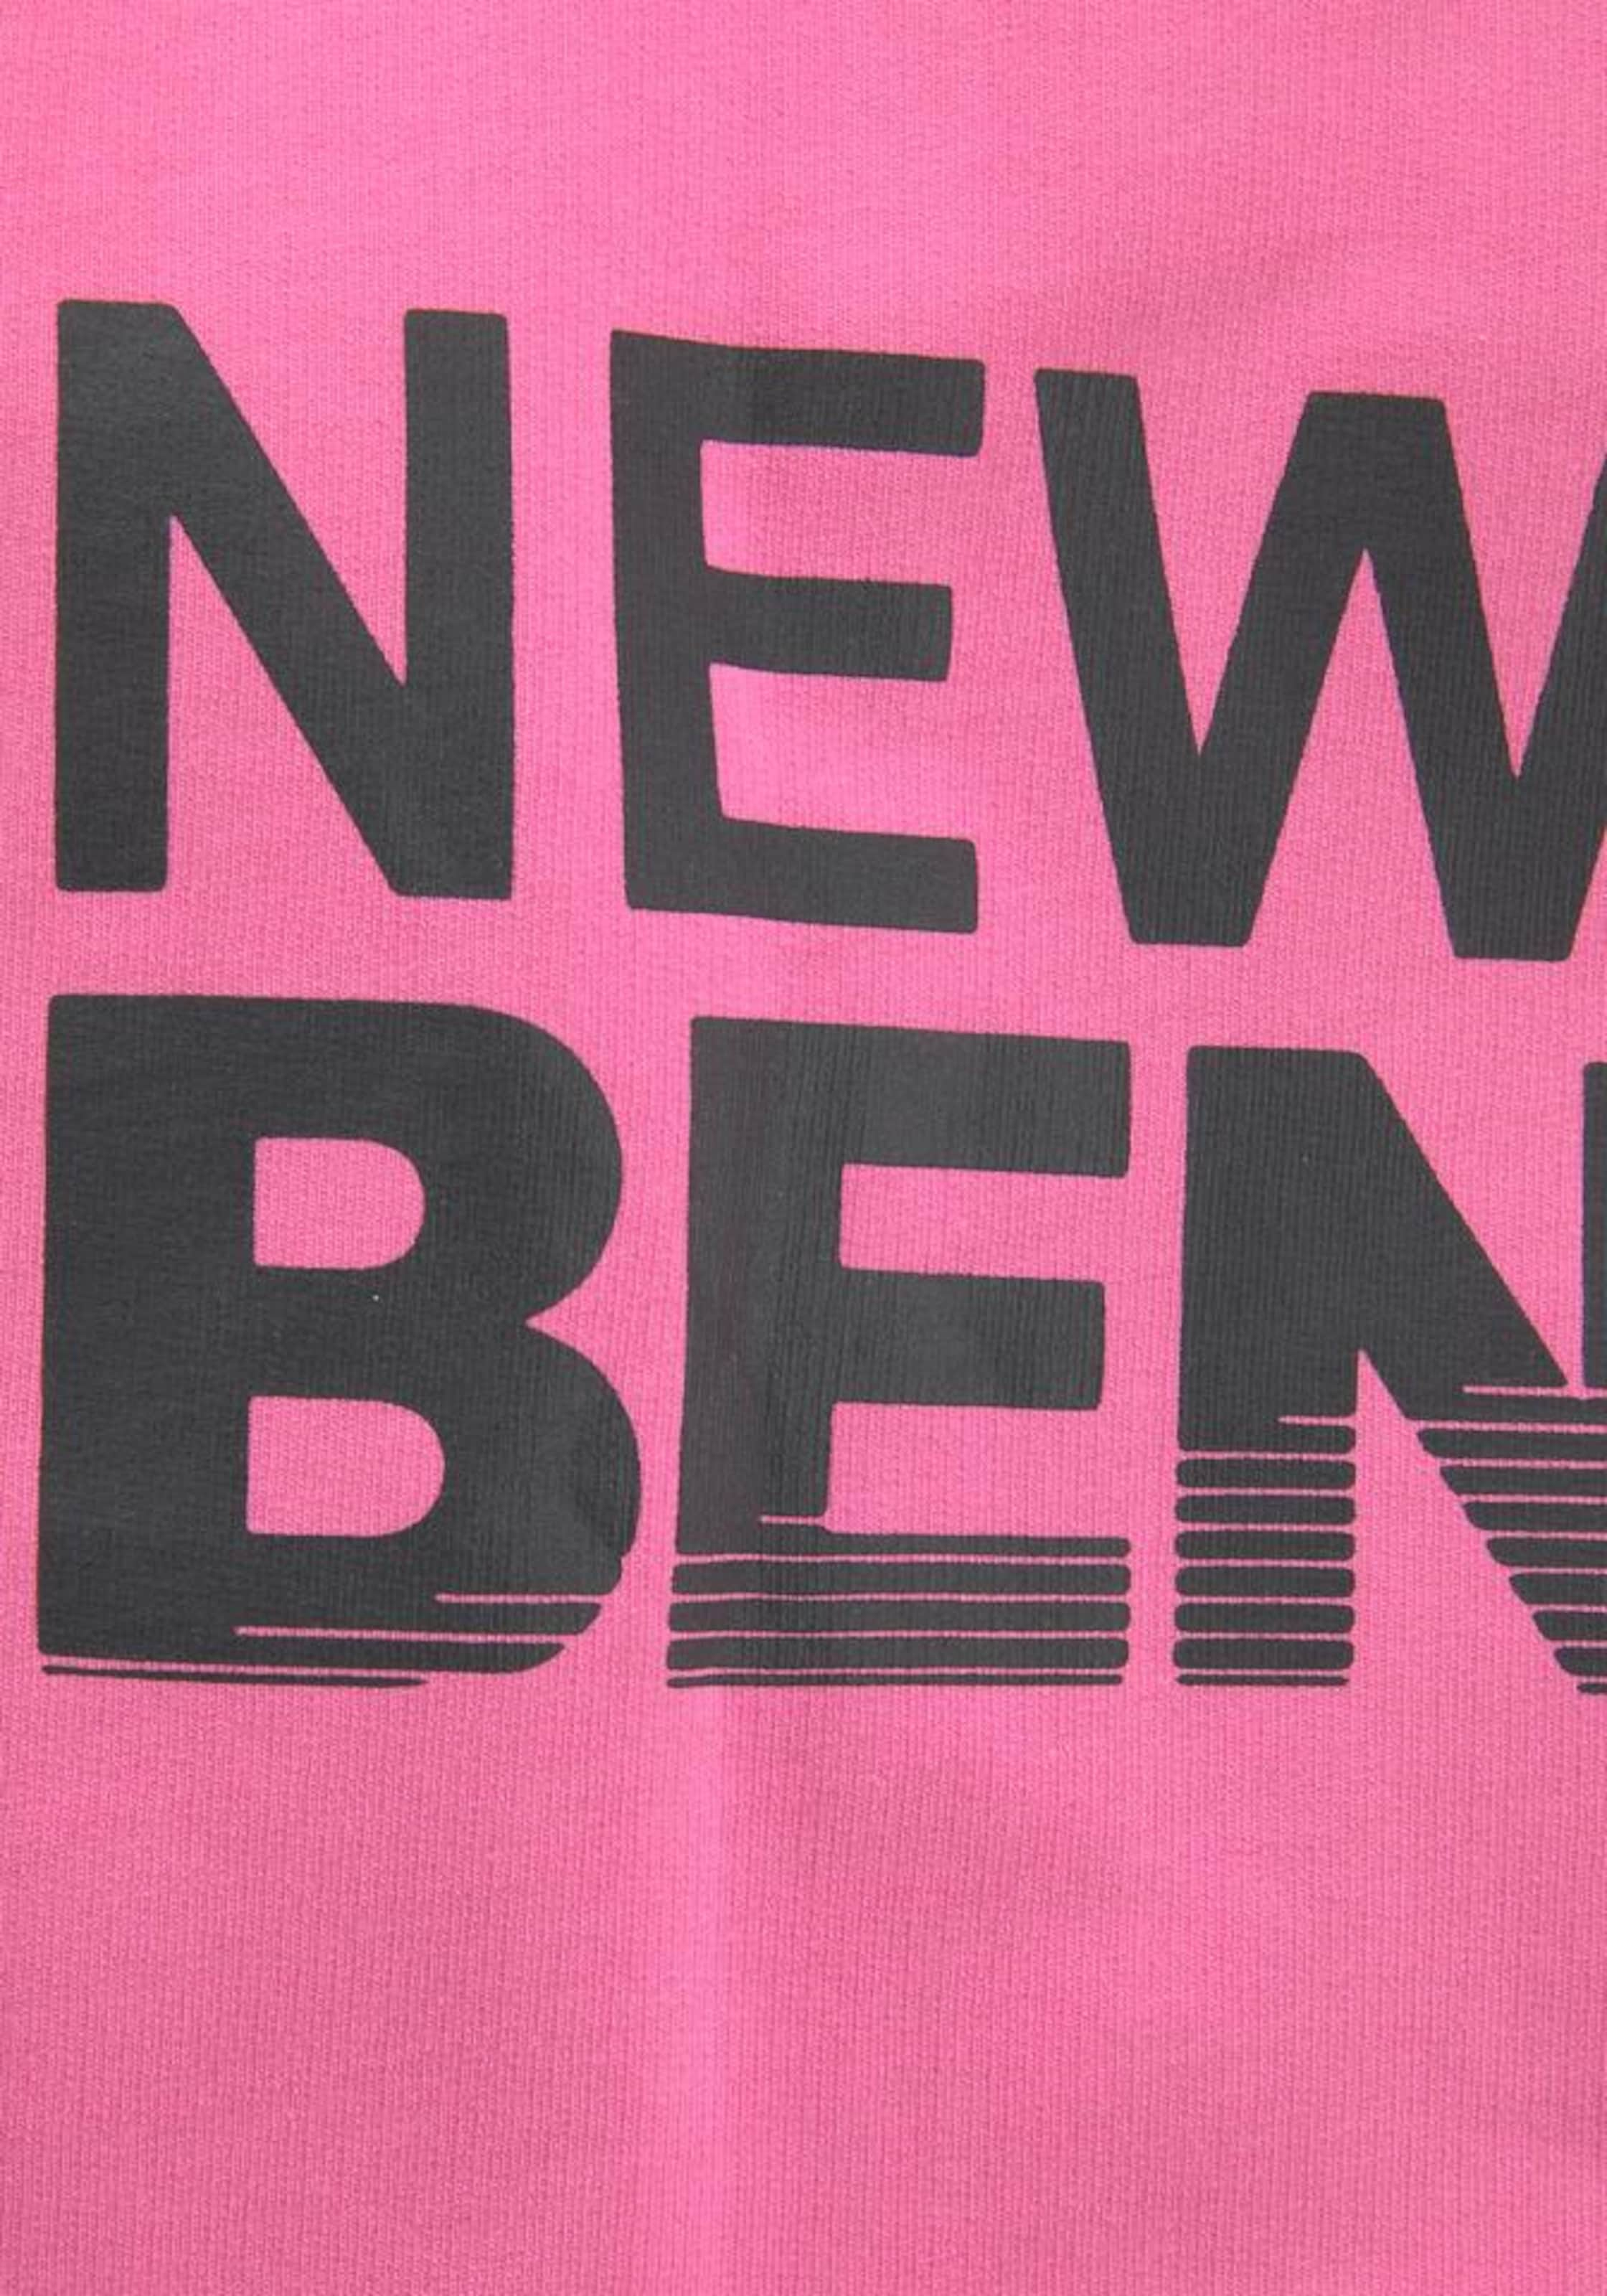 BENCH Longsweatshirt in pink